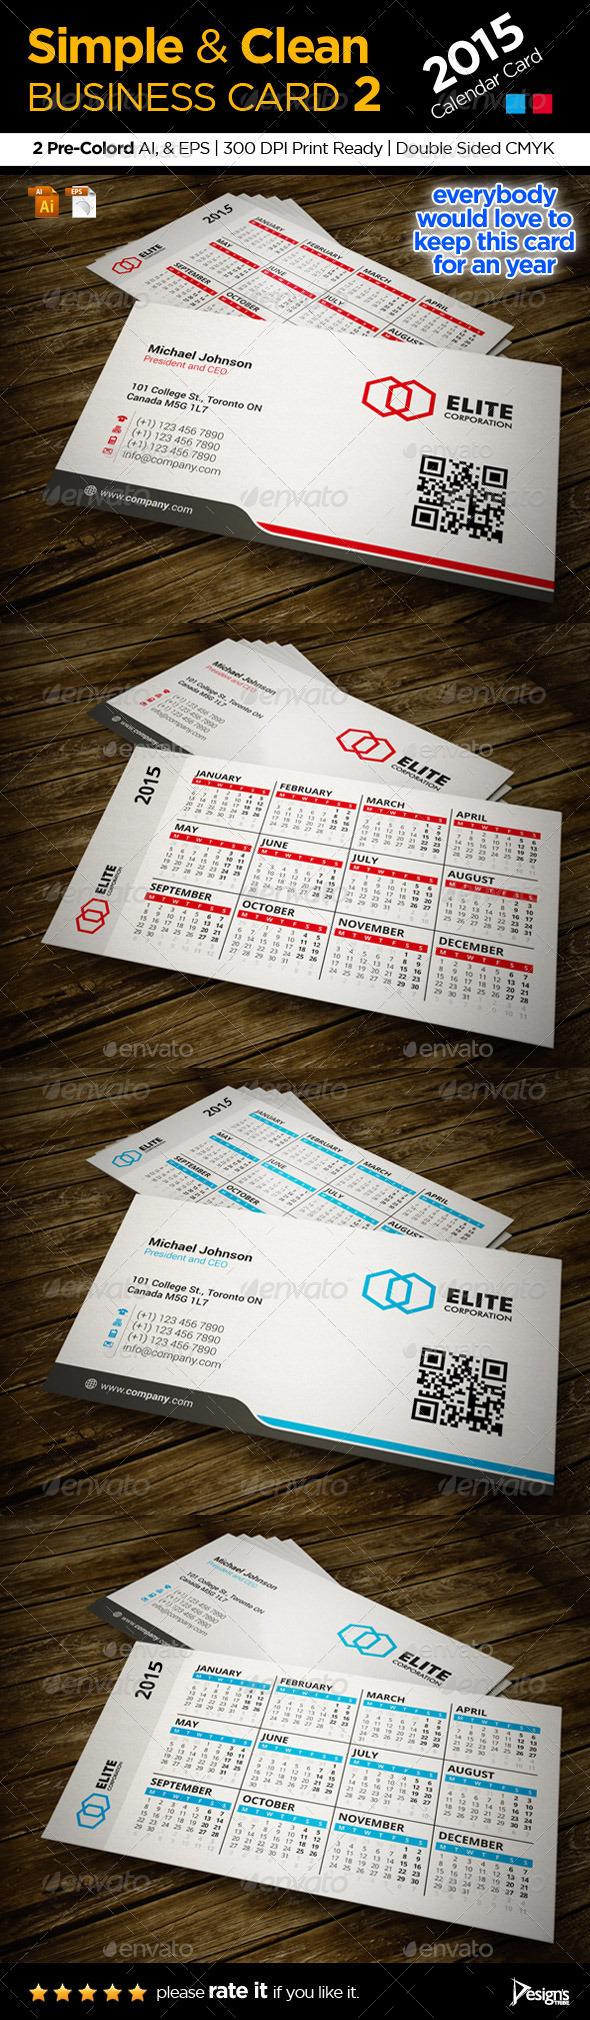 Calendar 2015 Business Card - Corporate Business Cards